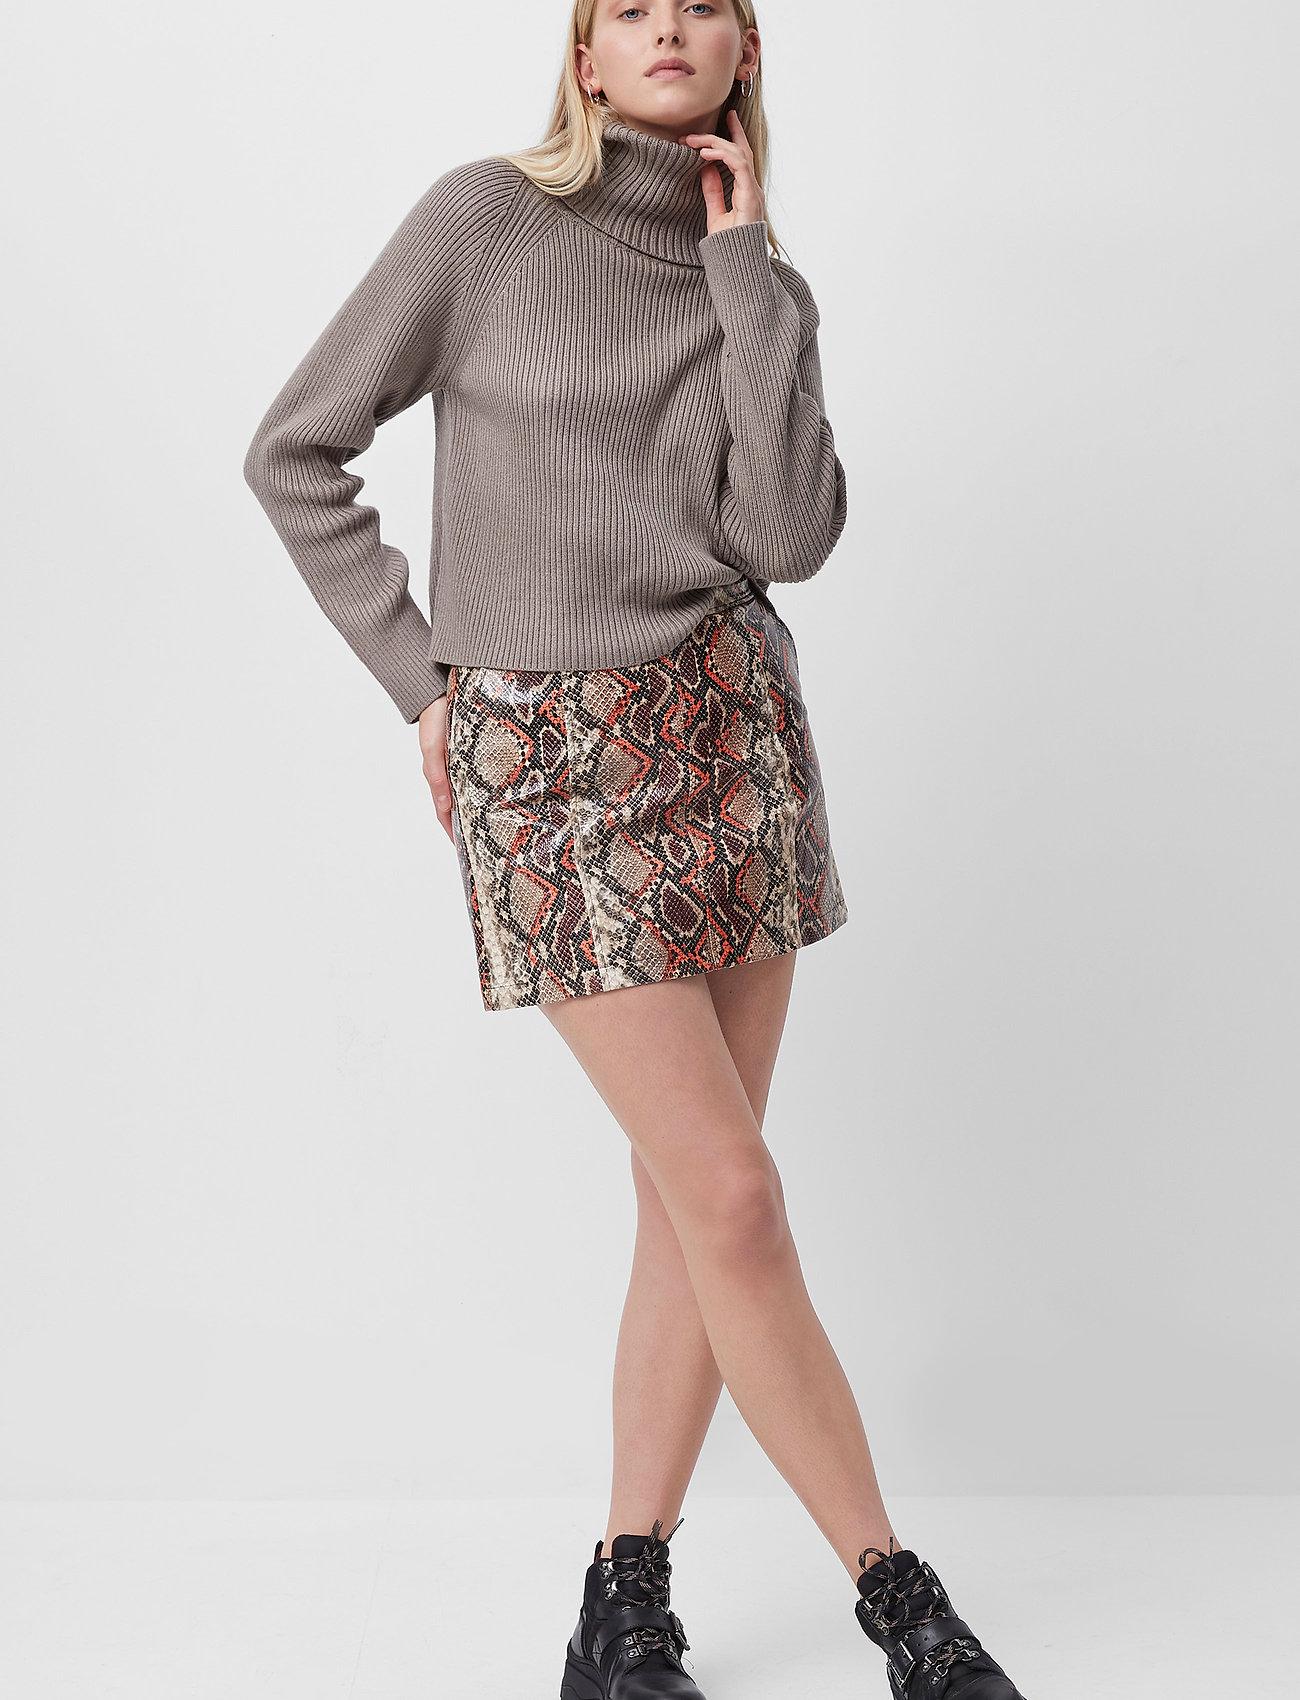 French Connection - BONNIE PU SKIRT - korta kjolar - neutral - 0